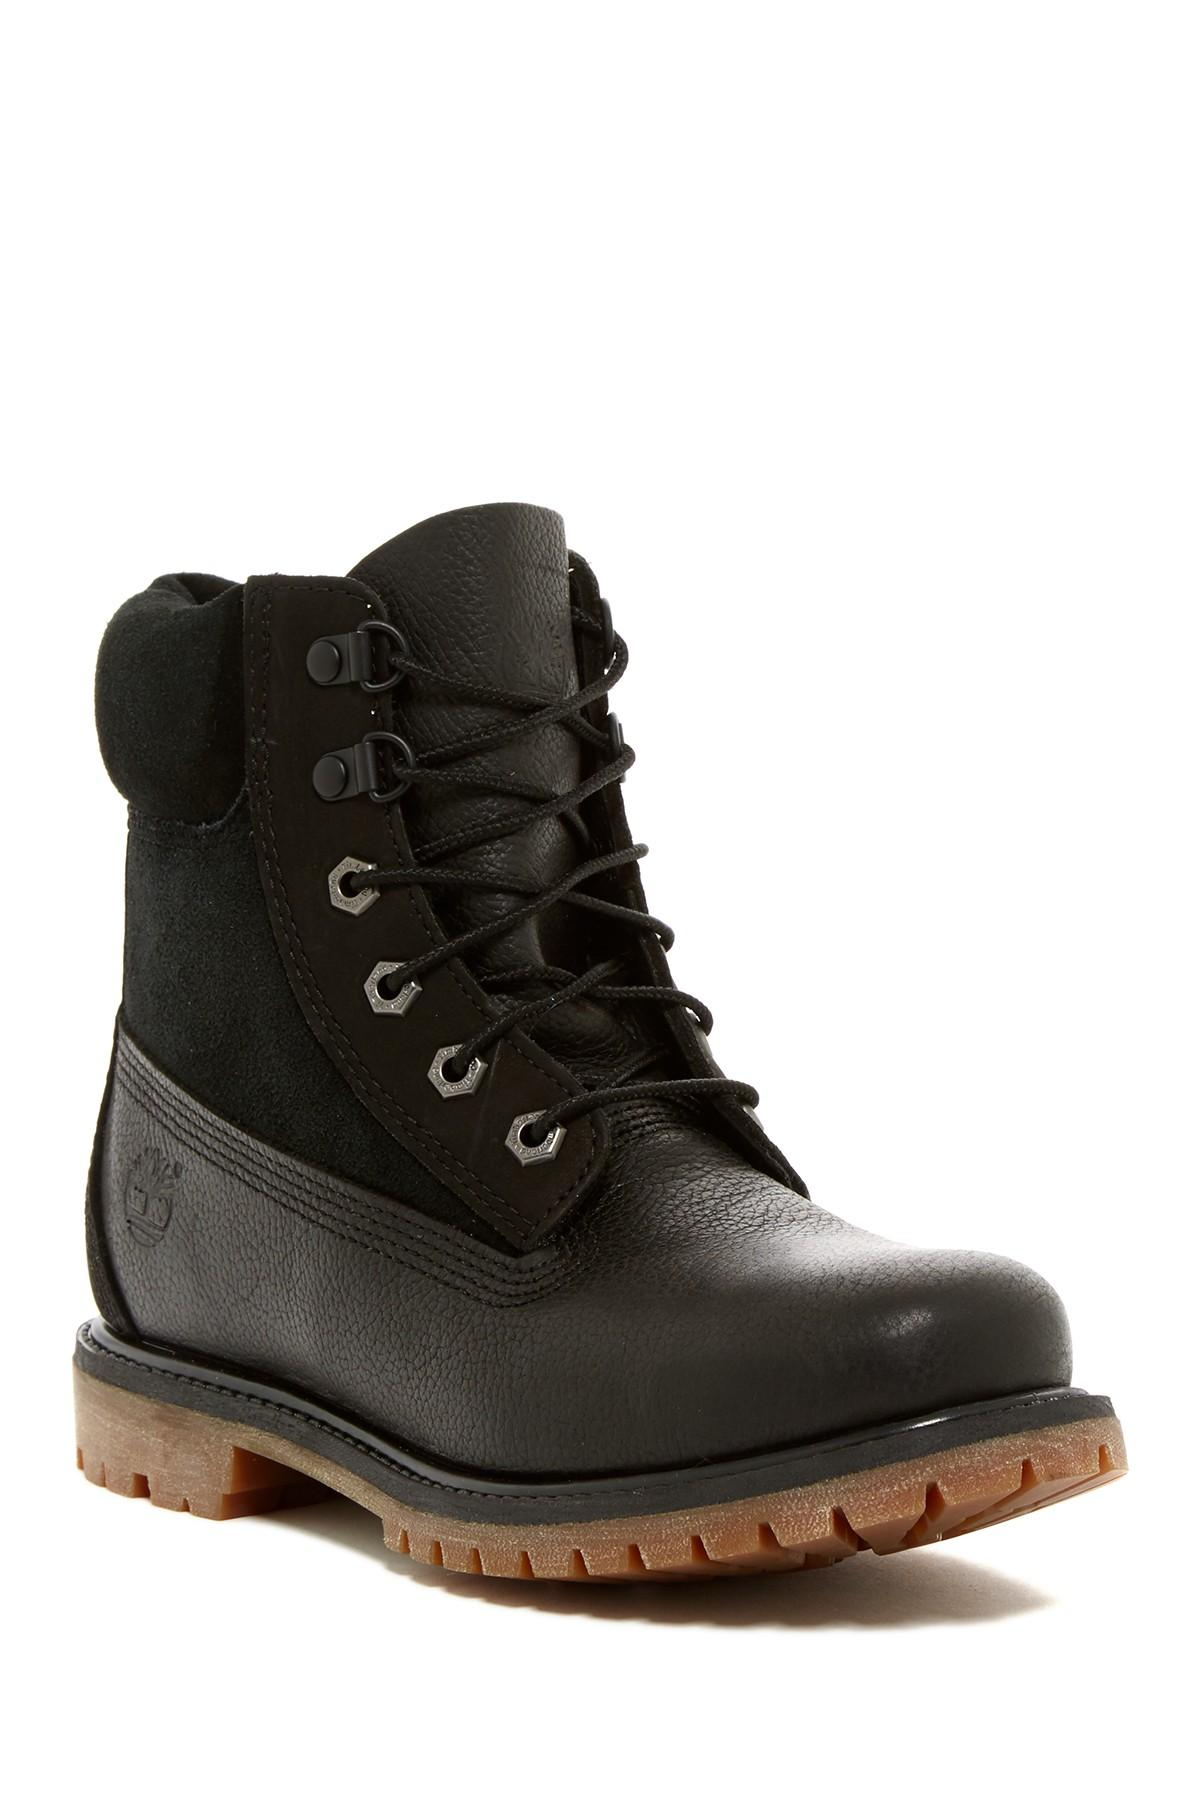 91d81718ea9 Lyst - Timberland 6 Inch Premium Waterproof Boot in Black